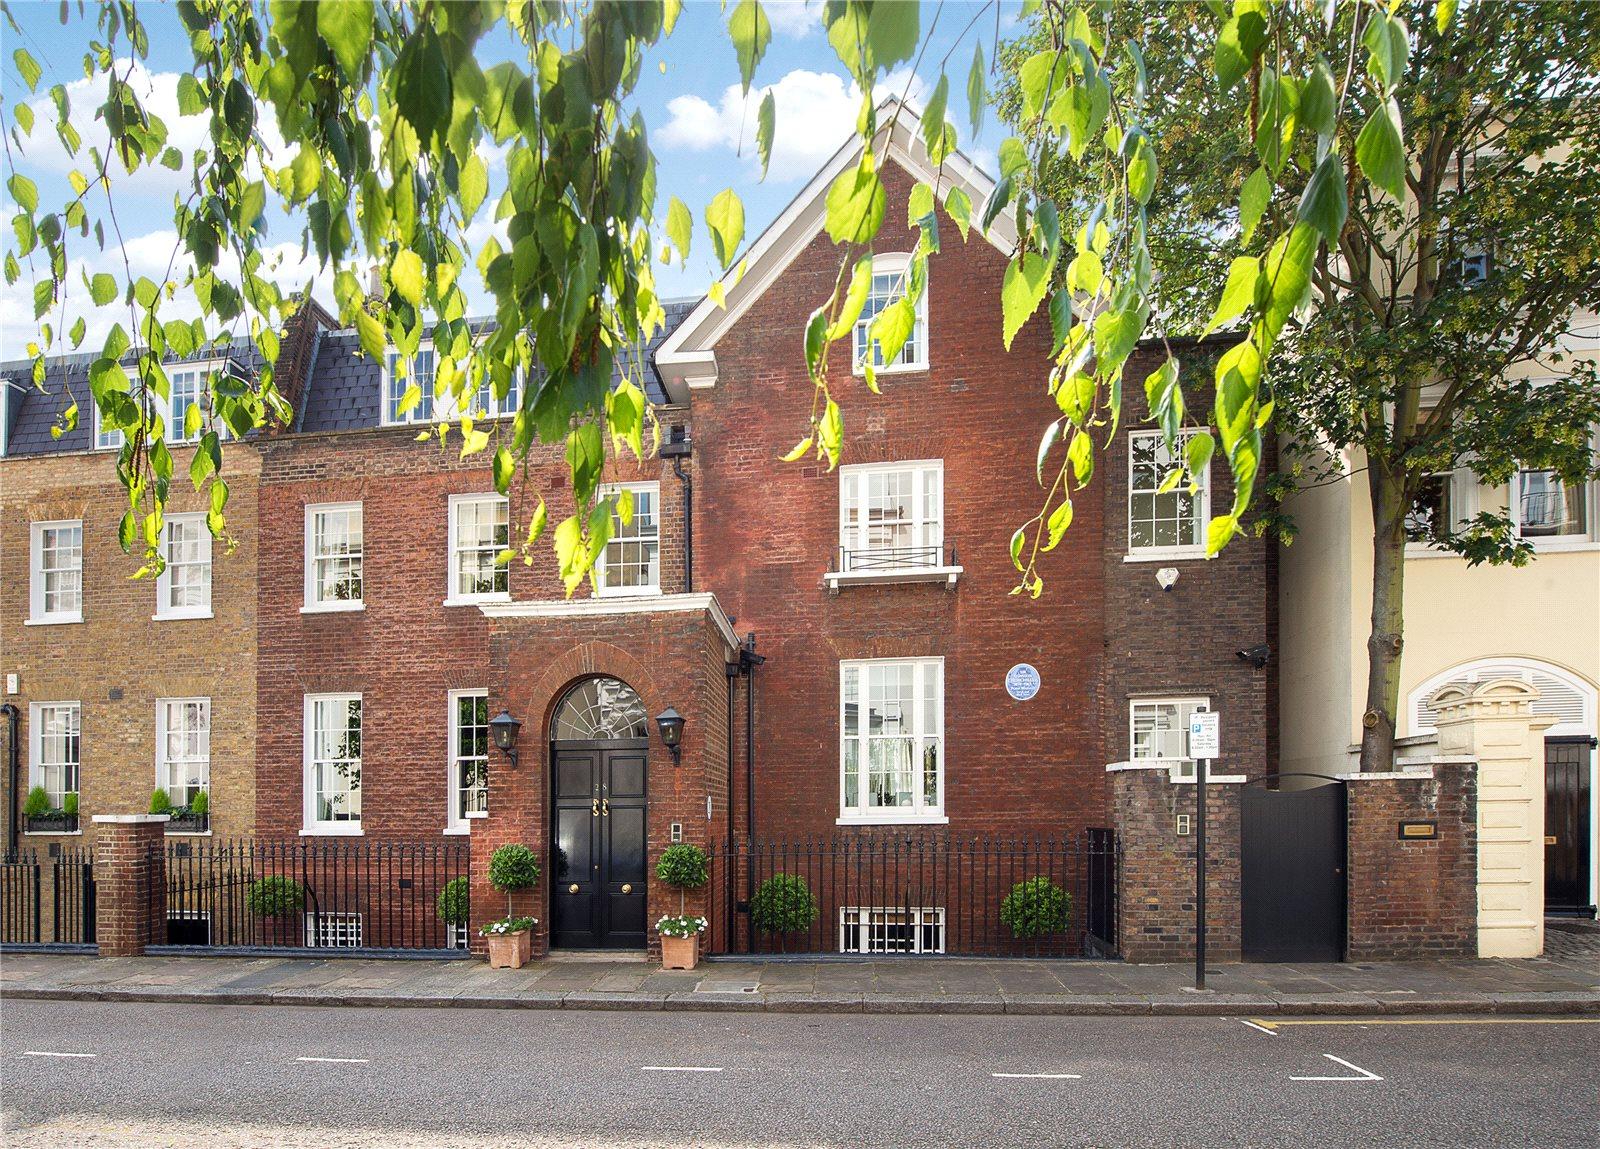 Single Family Home for Sale at Hyde Park Gate, Kensington, London, SW7 Kensington, London, England